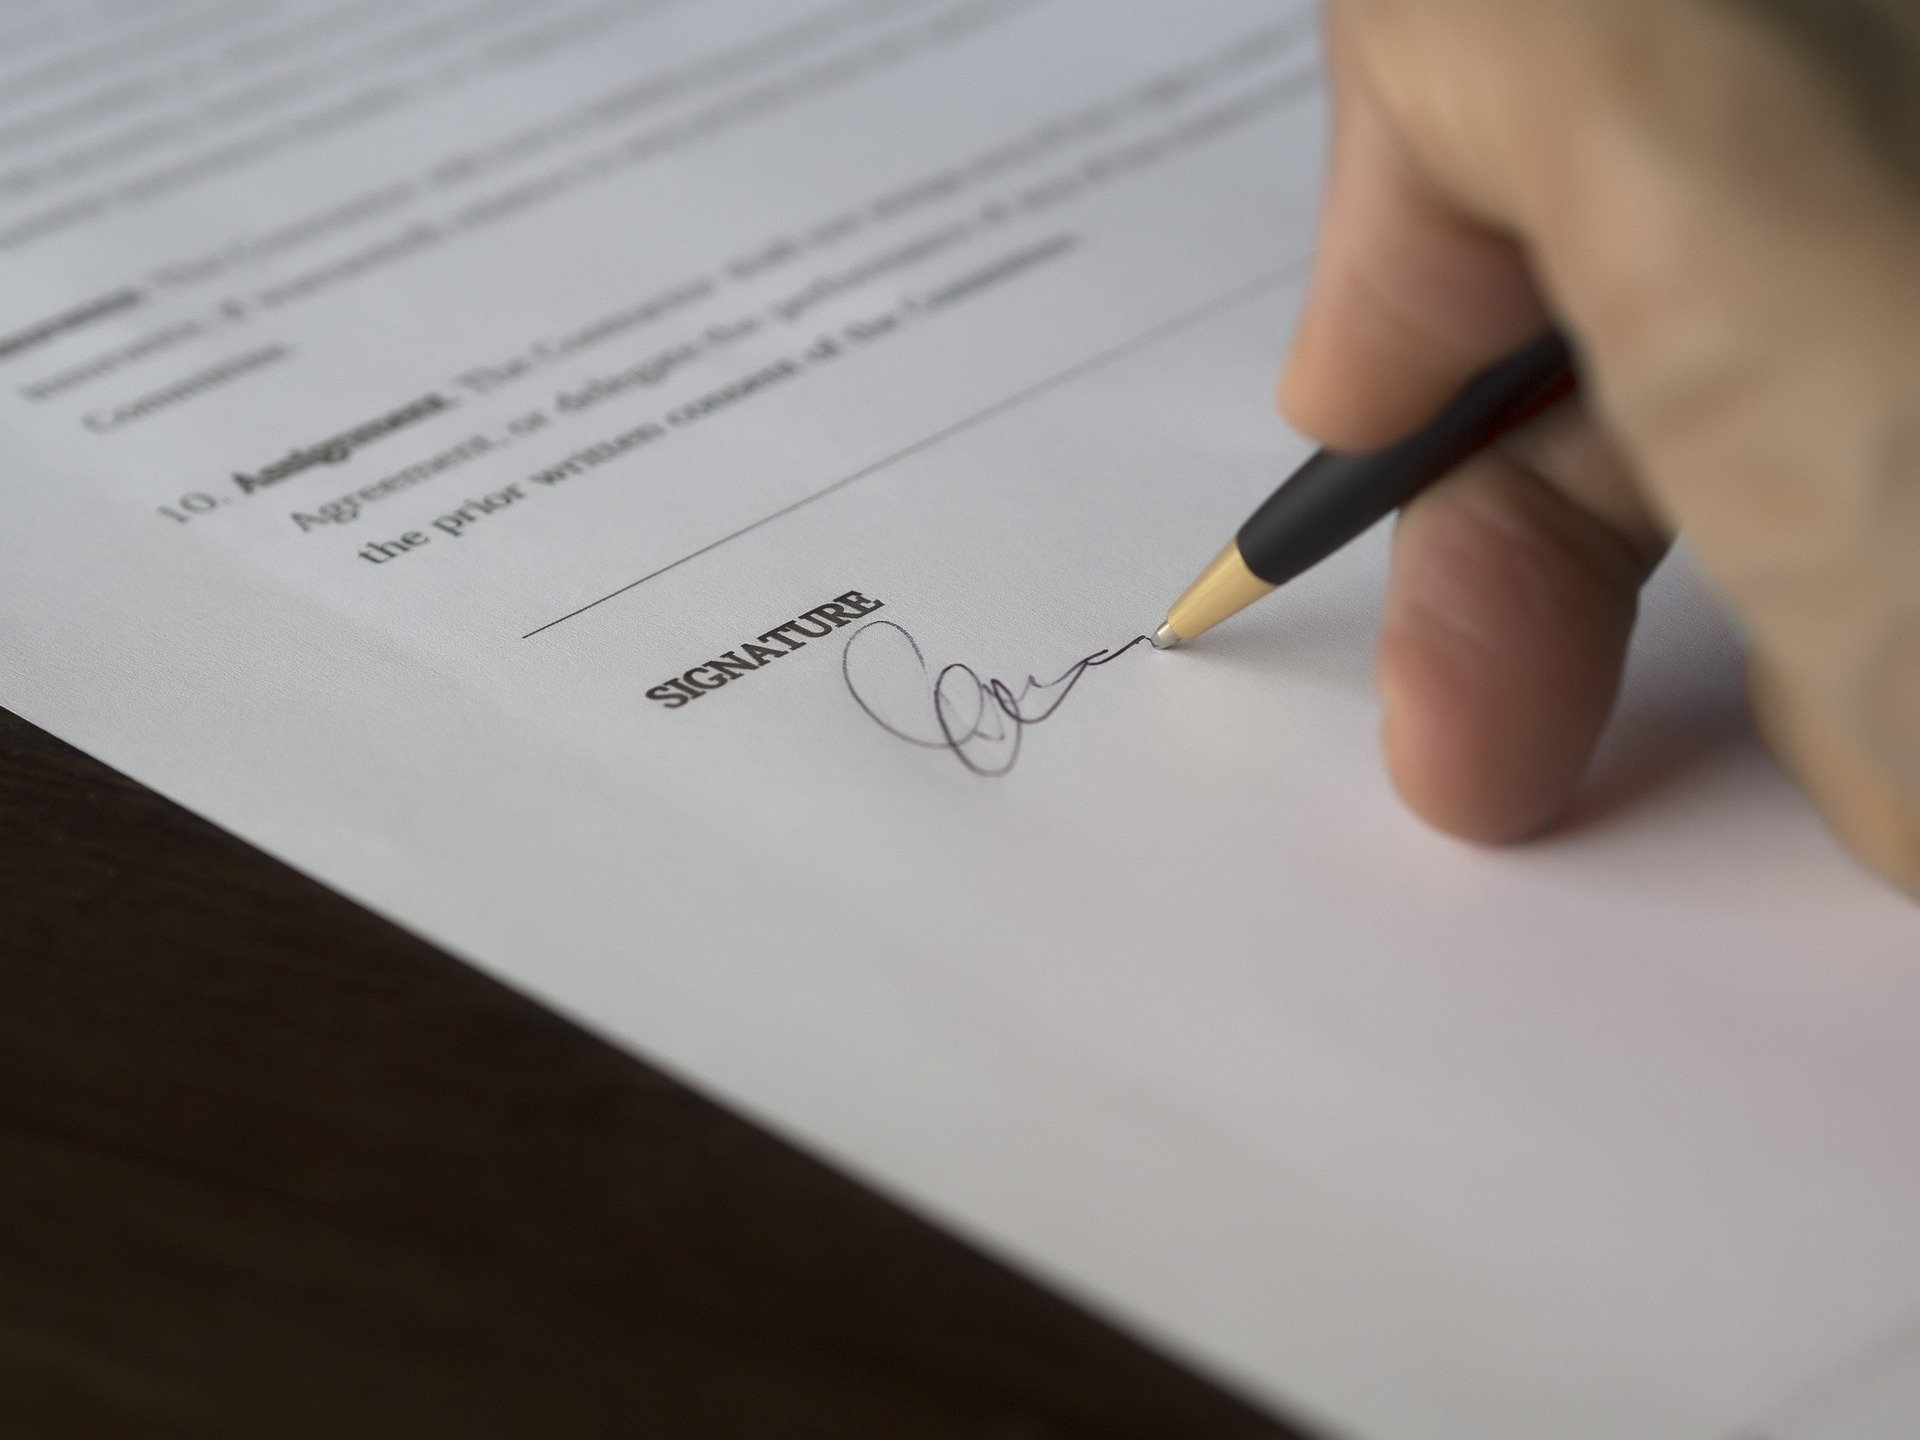 Forretning-underskrift